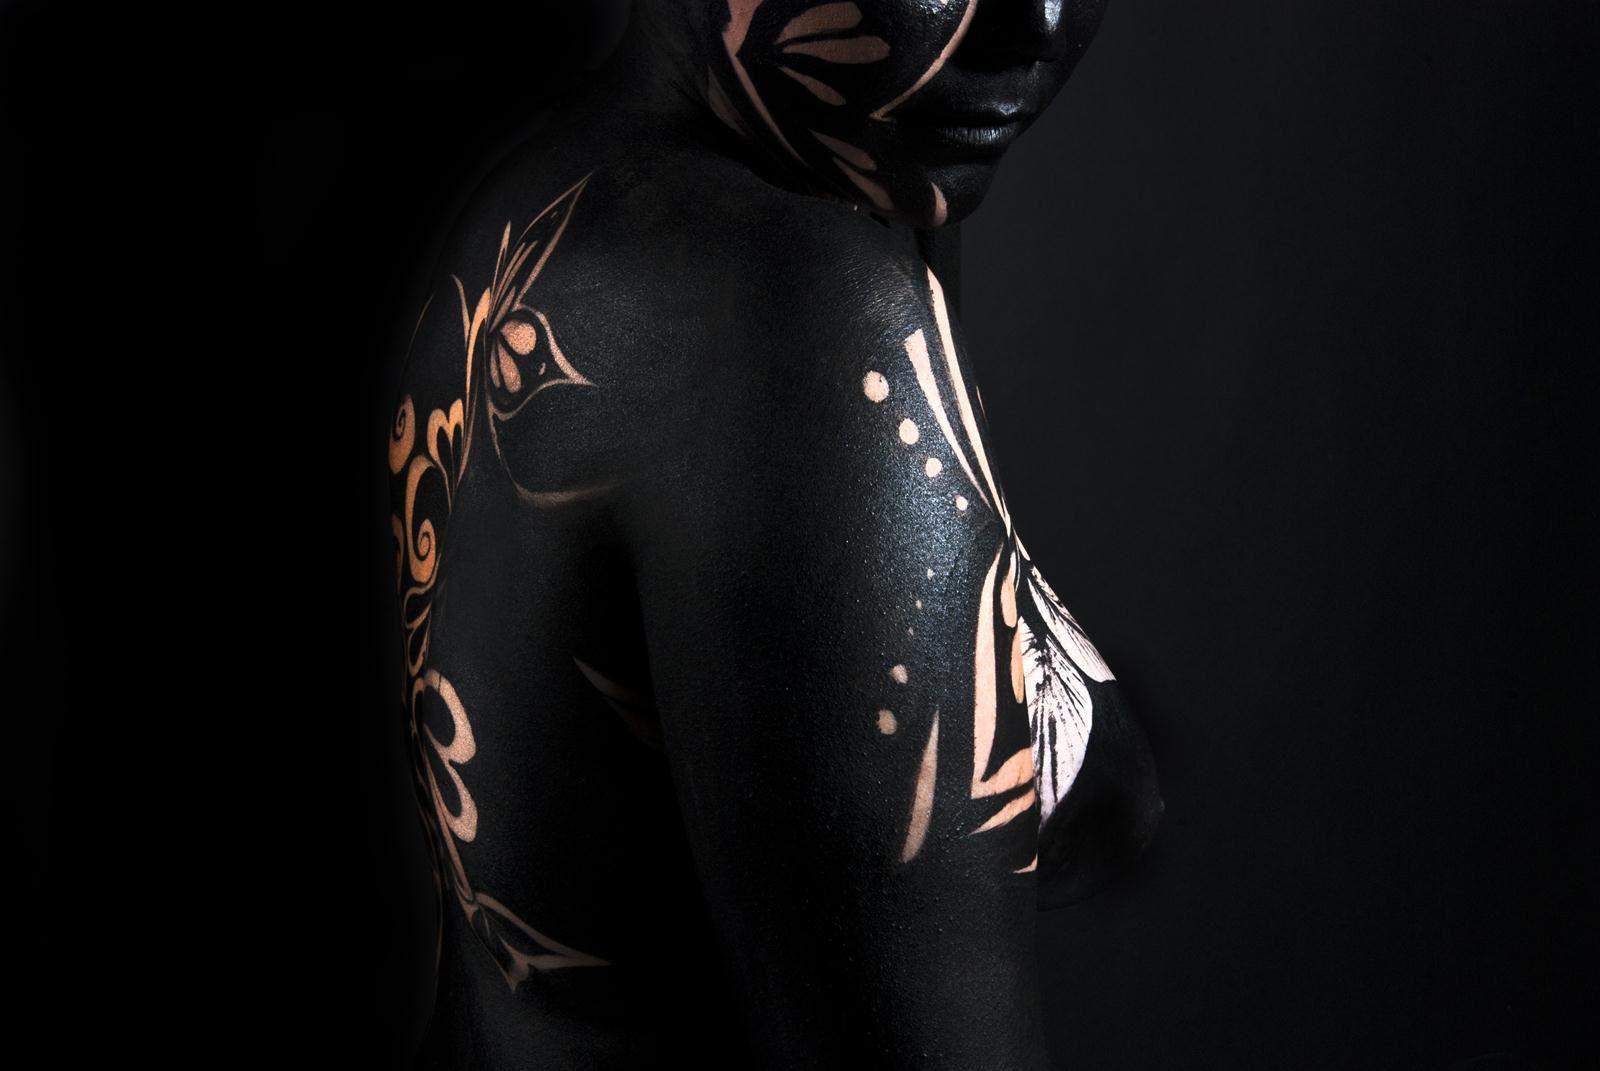 Body Painting Black & White